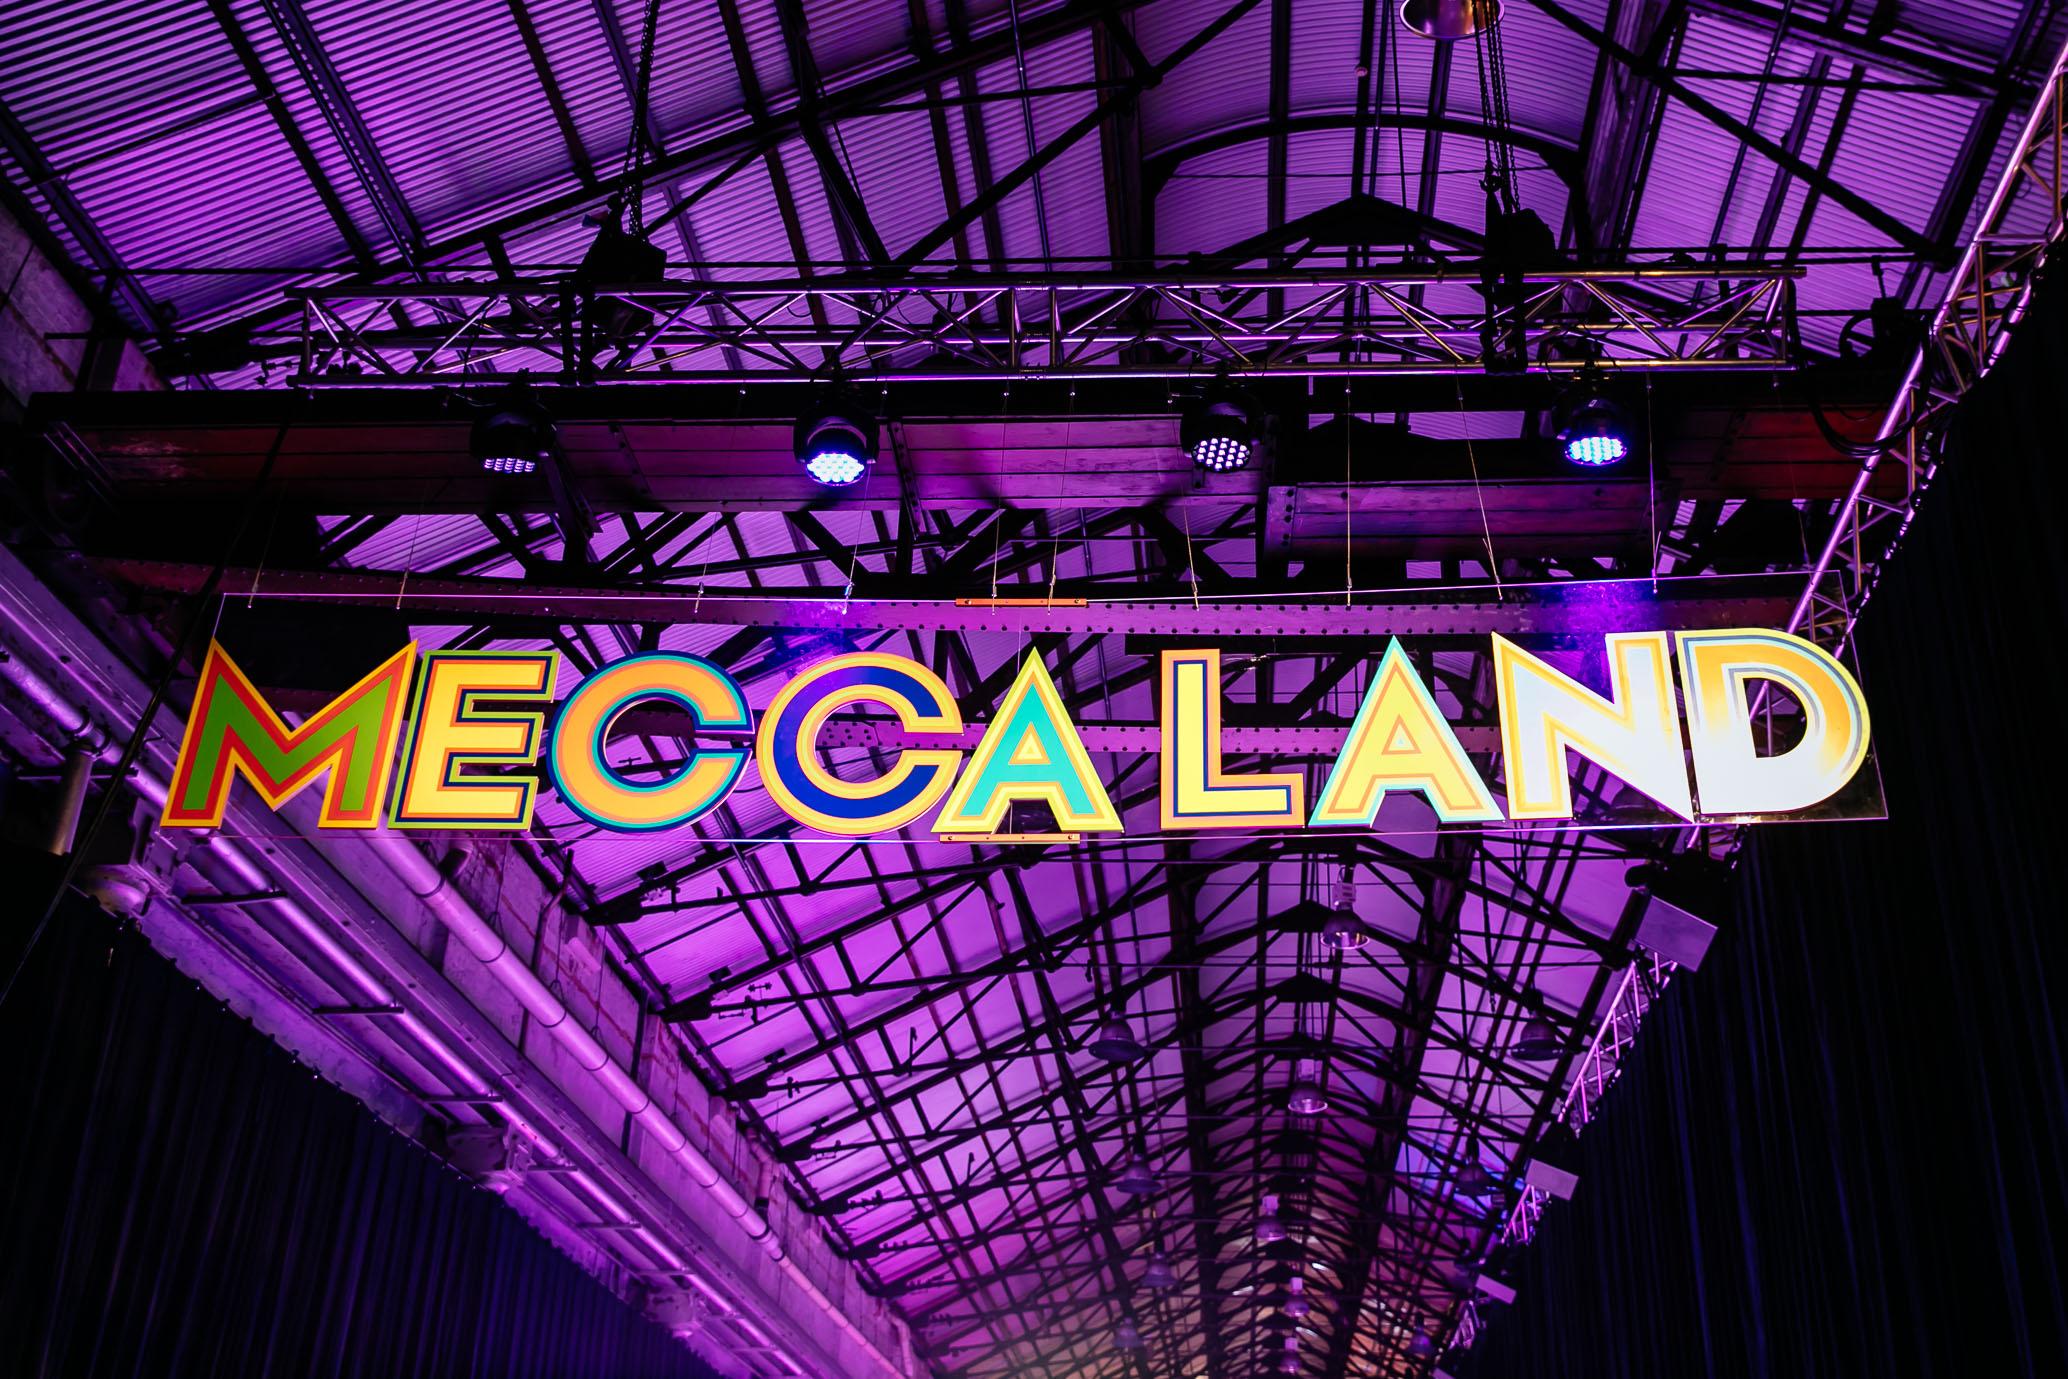 MECCALAND_Entrance Sign